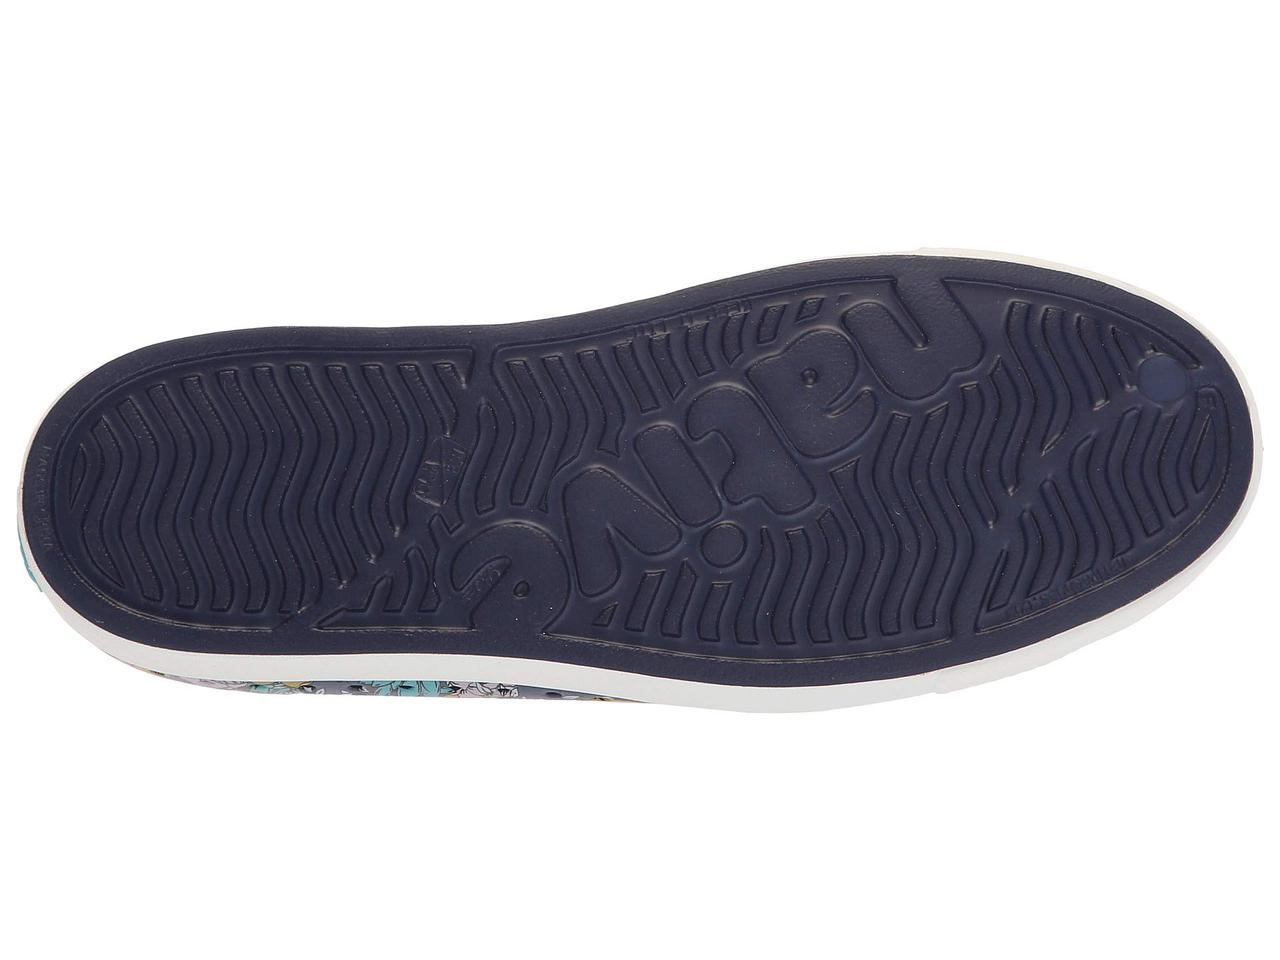 e5f1141eabc3 ... Кроссовки Кеды (Оригинал) Native Shoes Jefferson Regatta Blue Shell  White Jardin ...